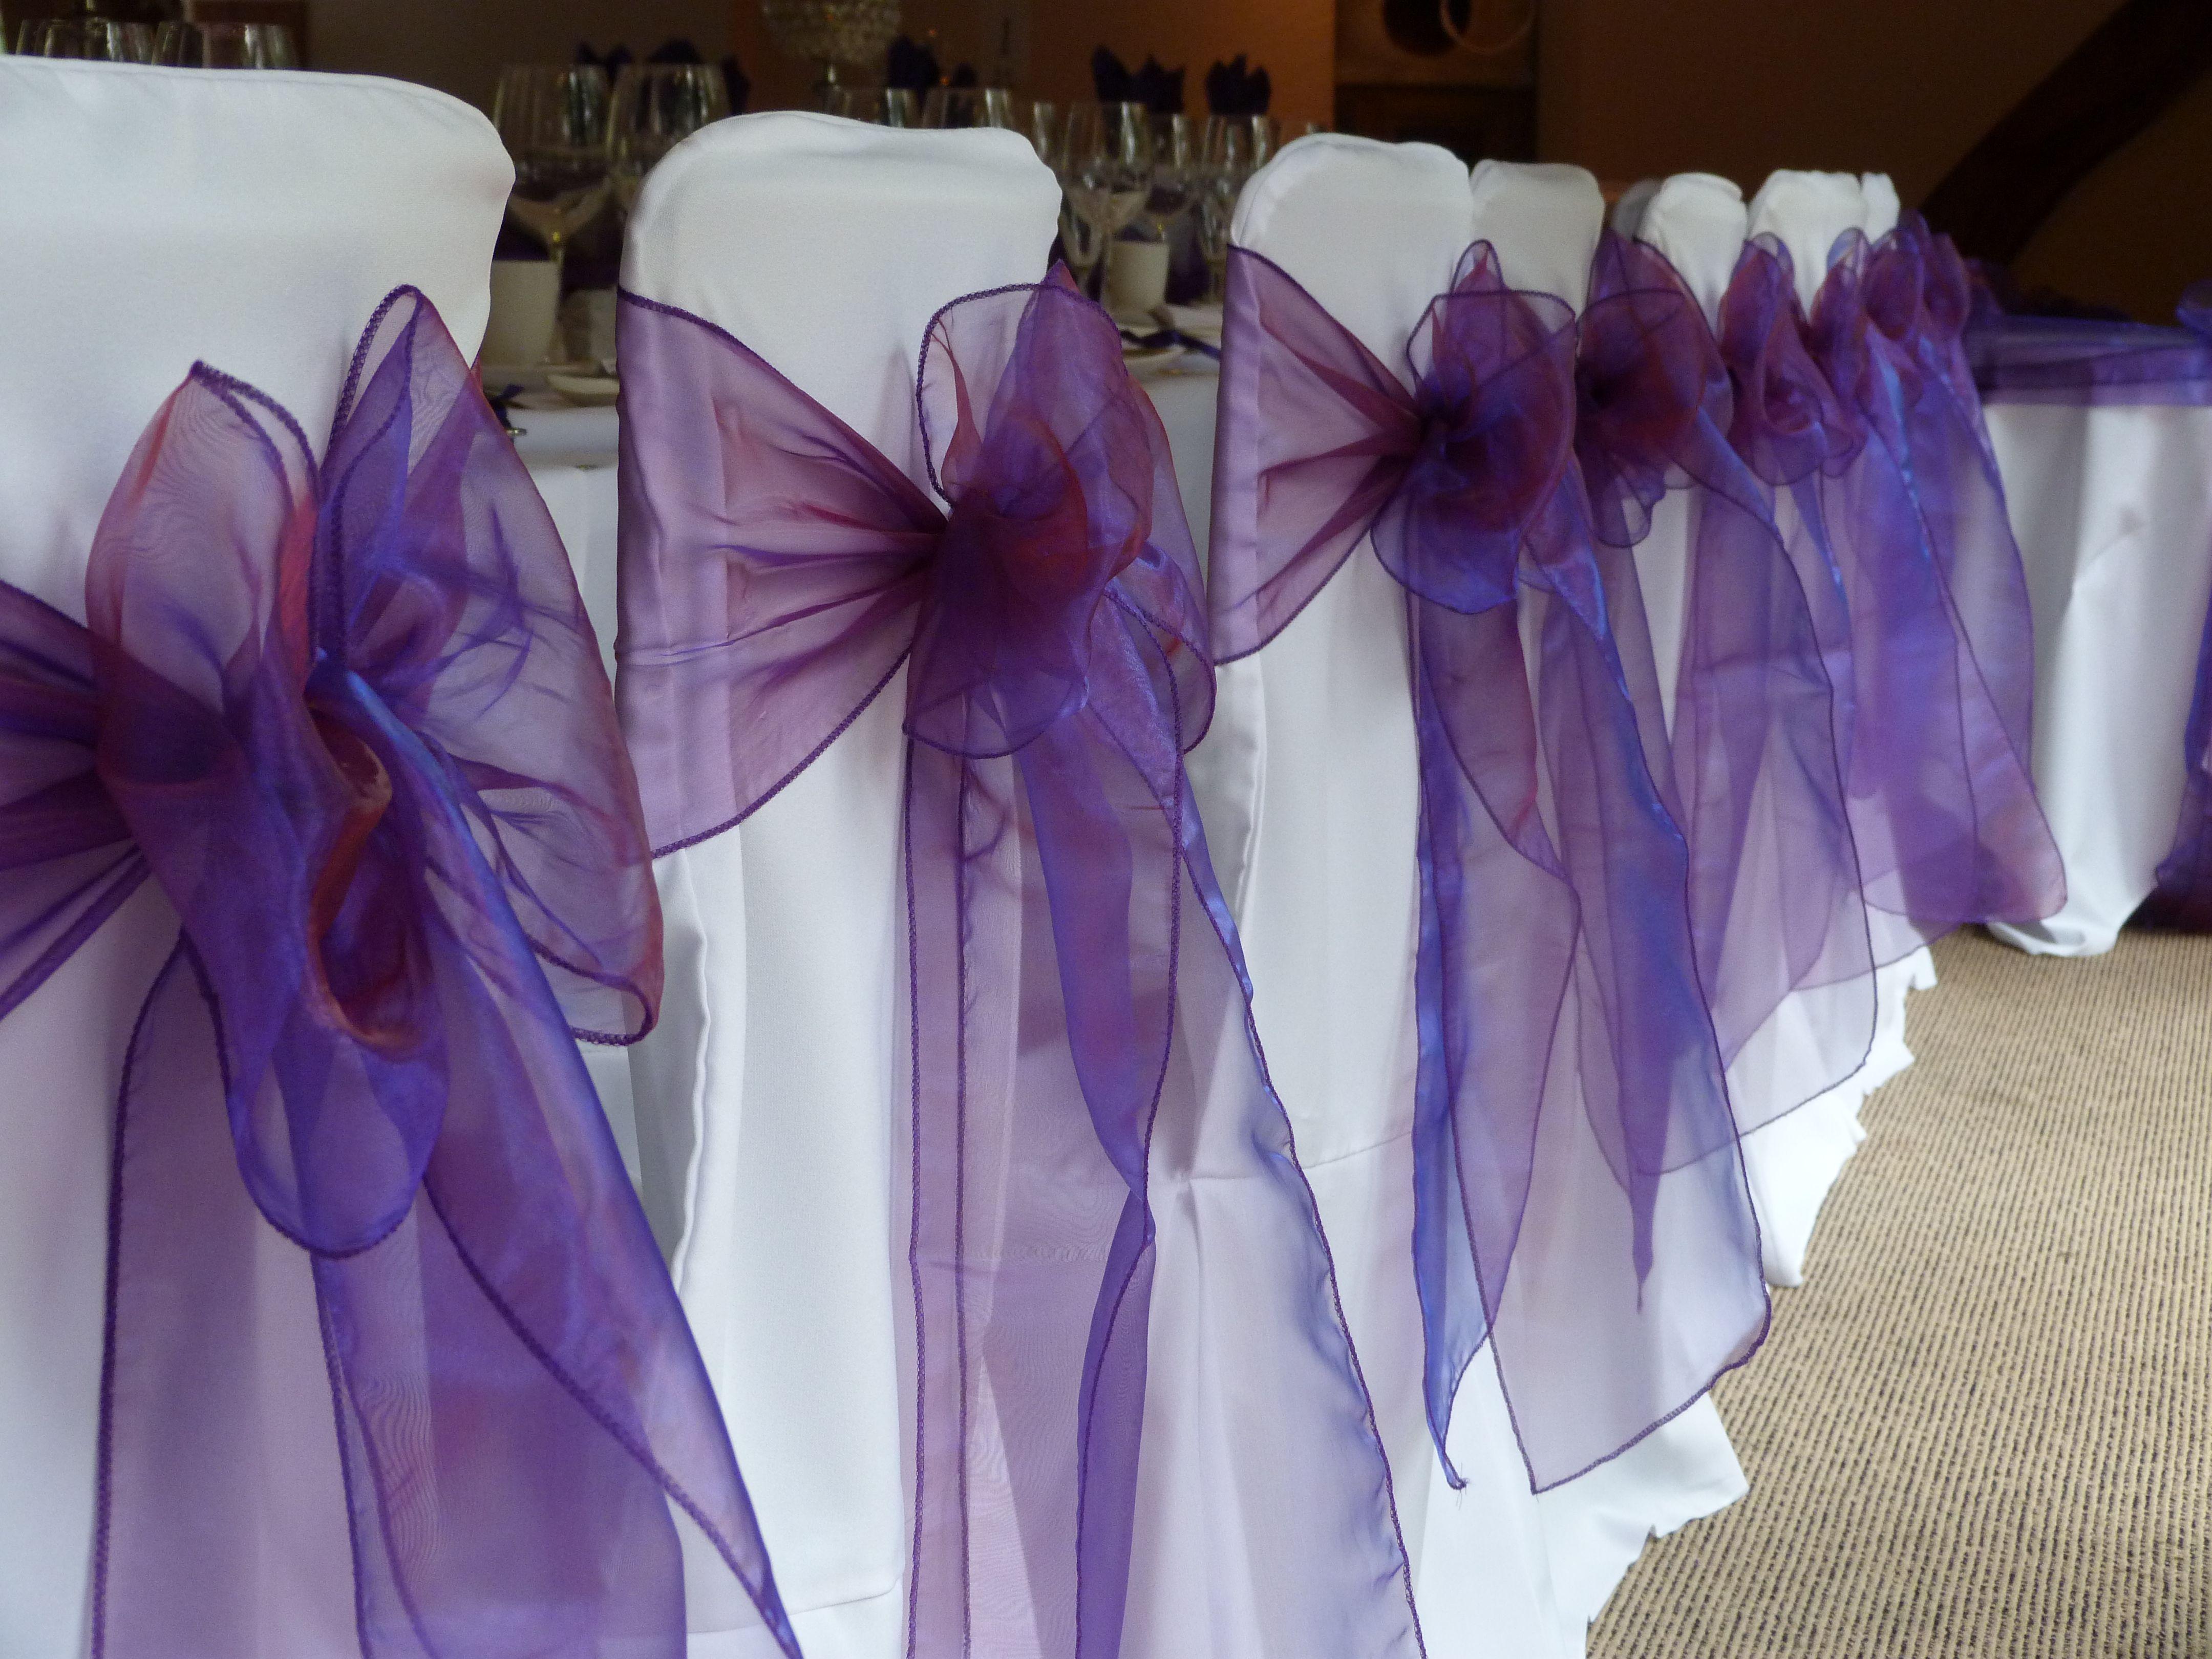 cadbury purple ceremony set up boughton golf club east kent http